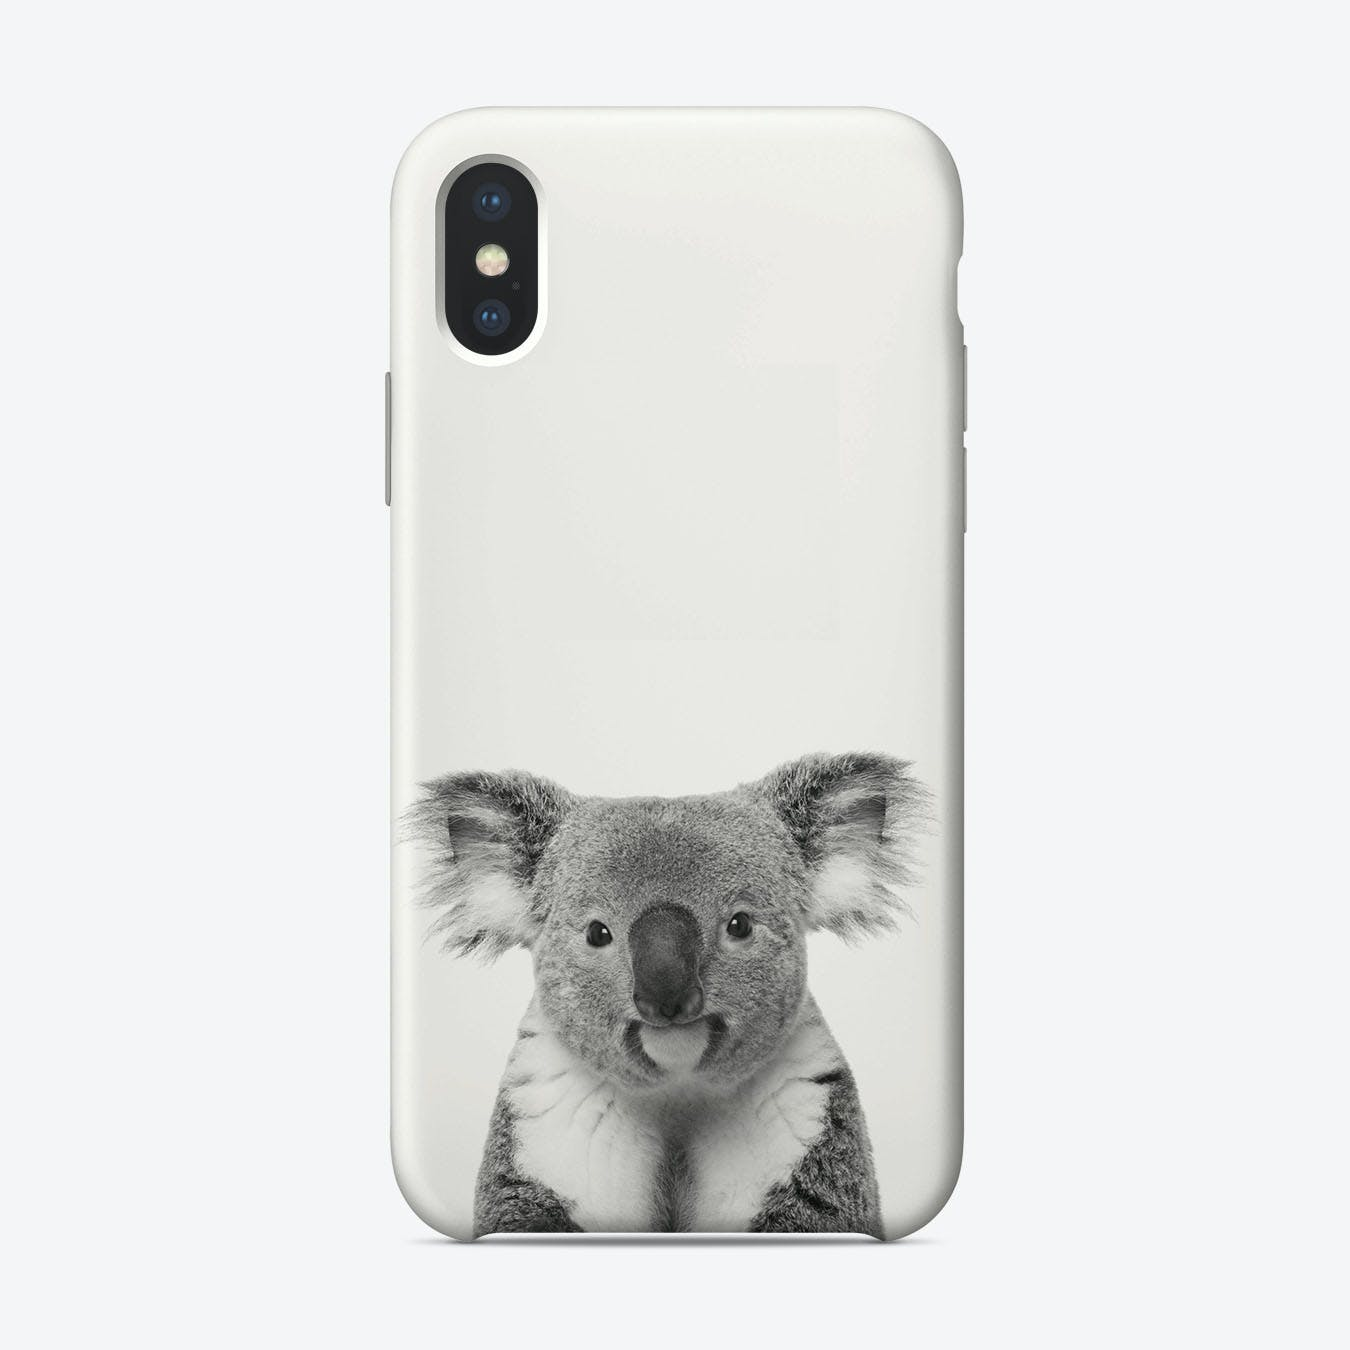 Koala B&W iPhone Case